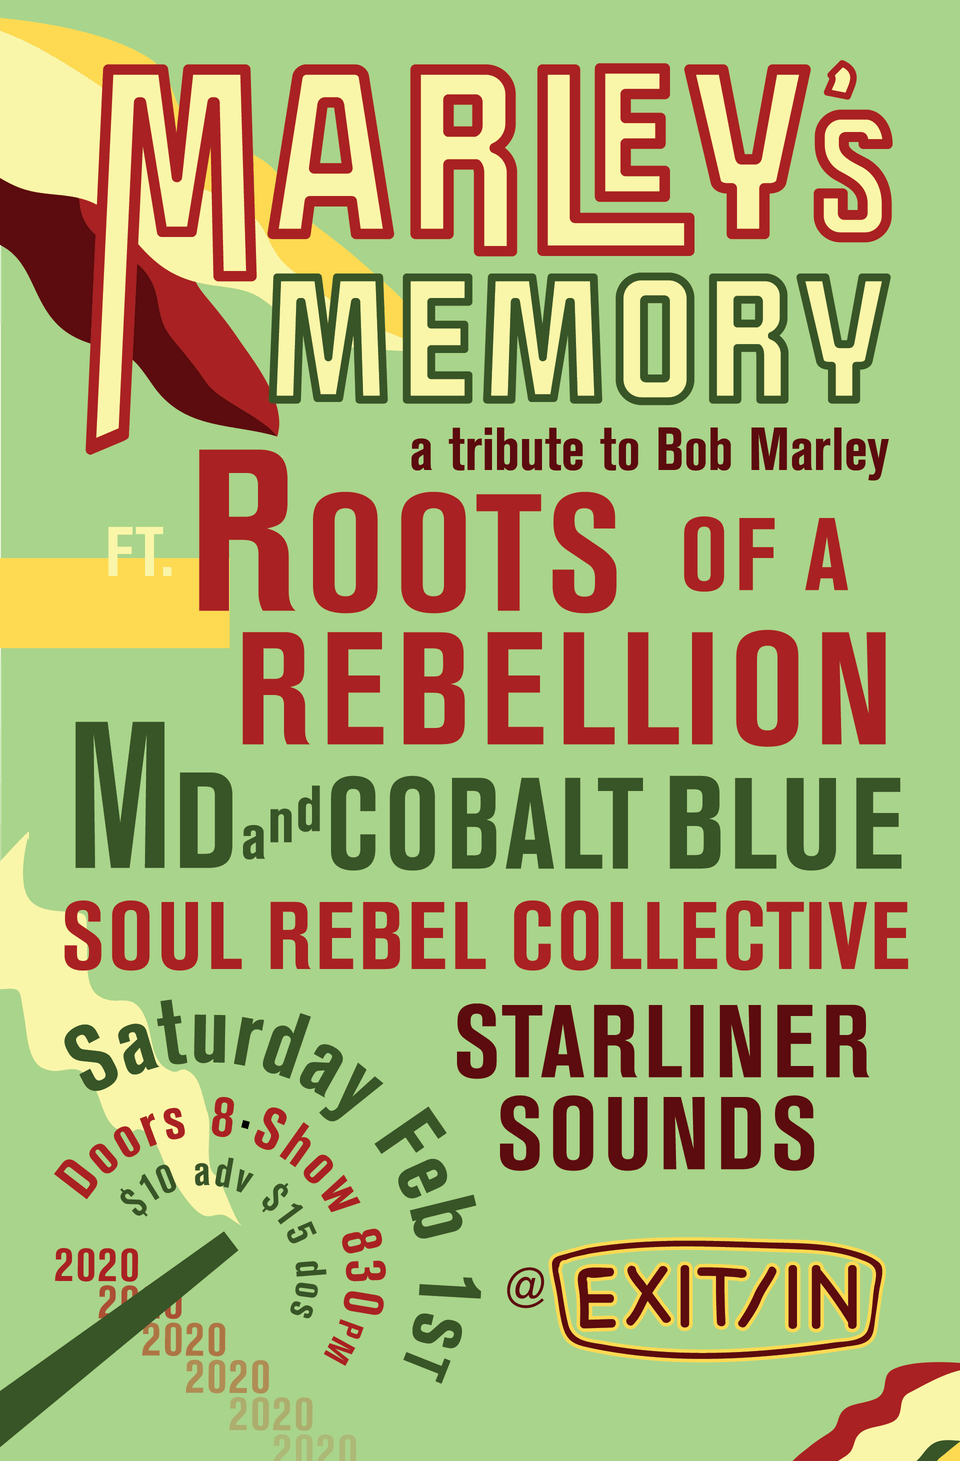 Marley's Memory